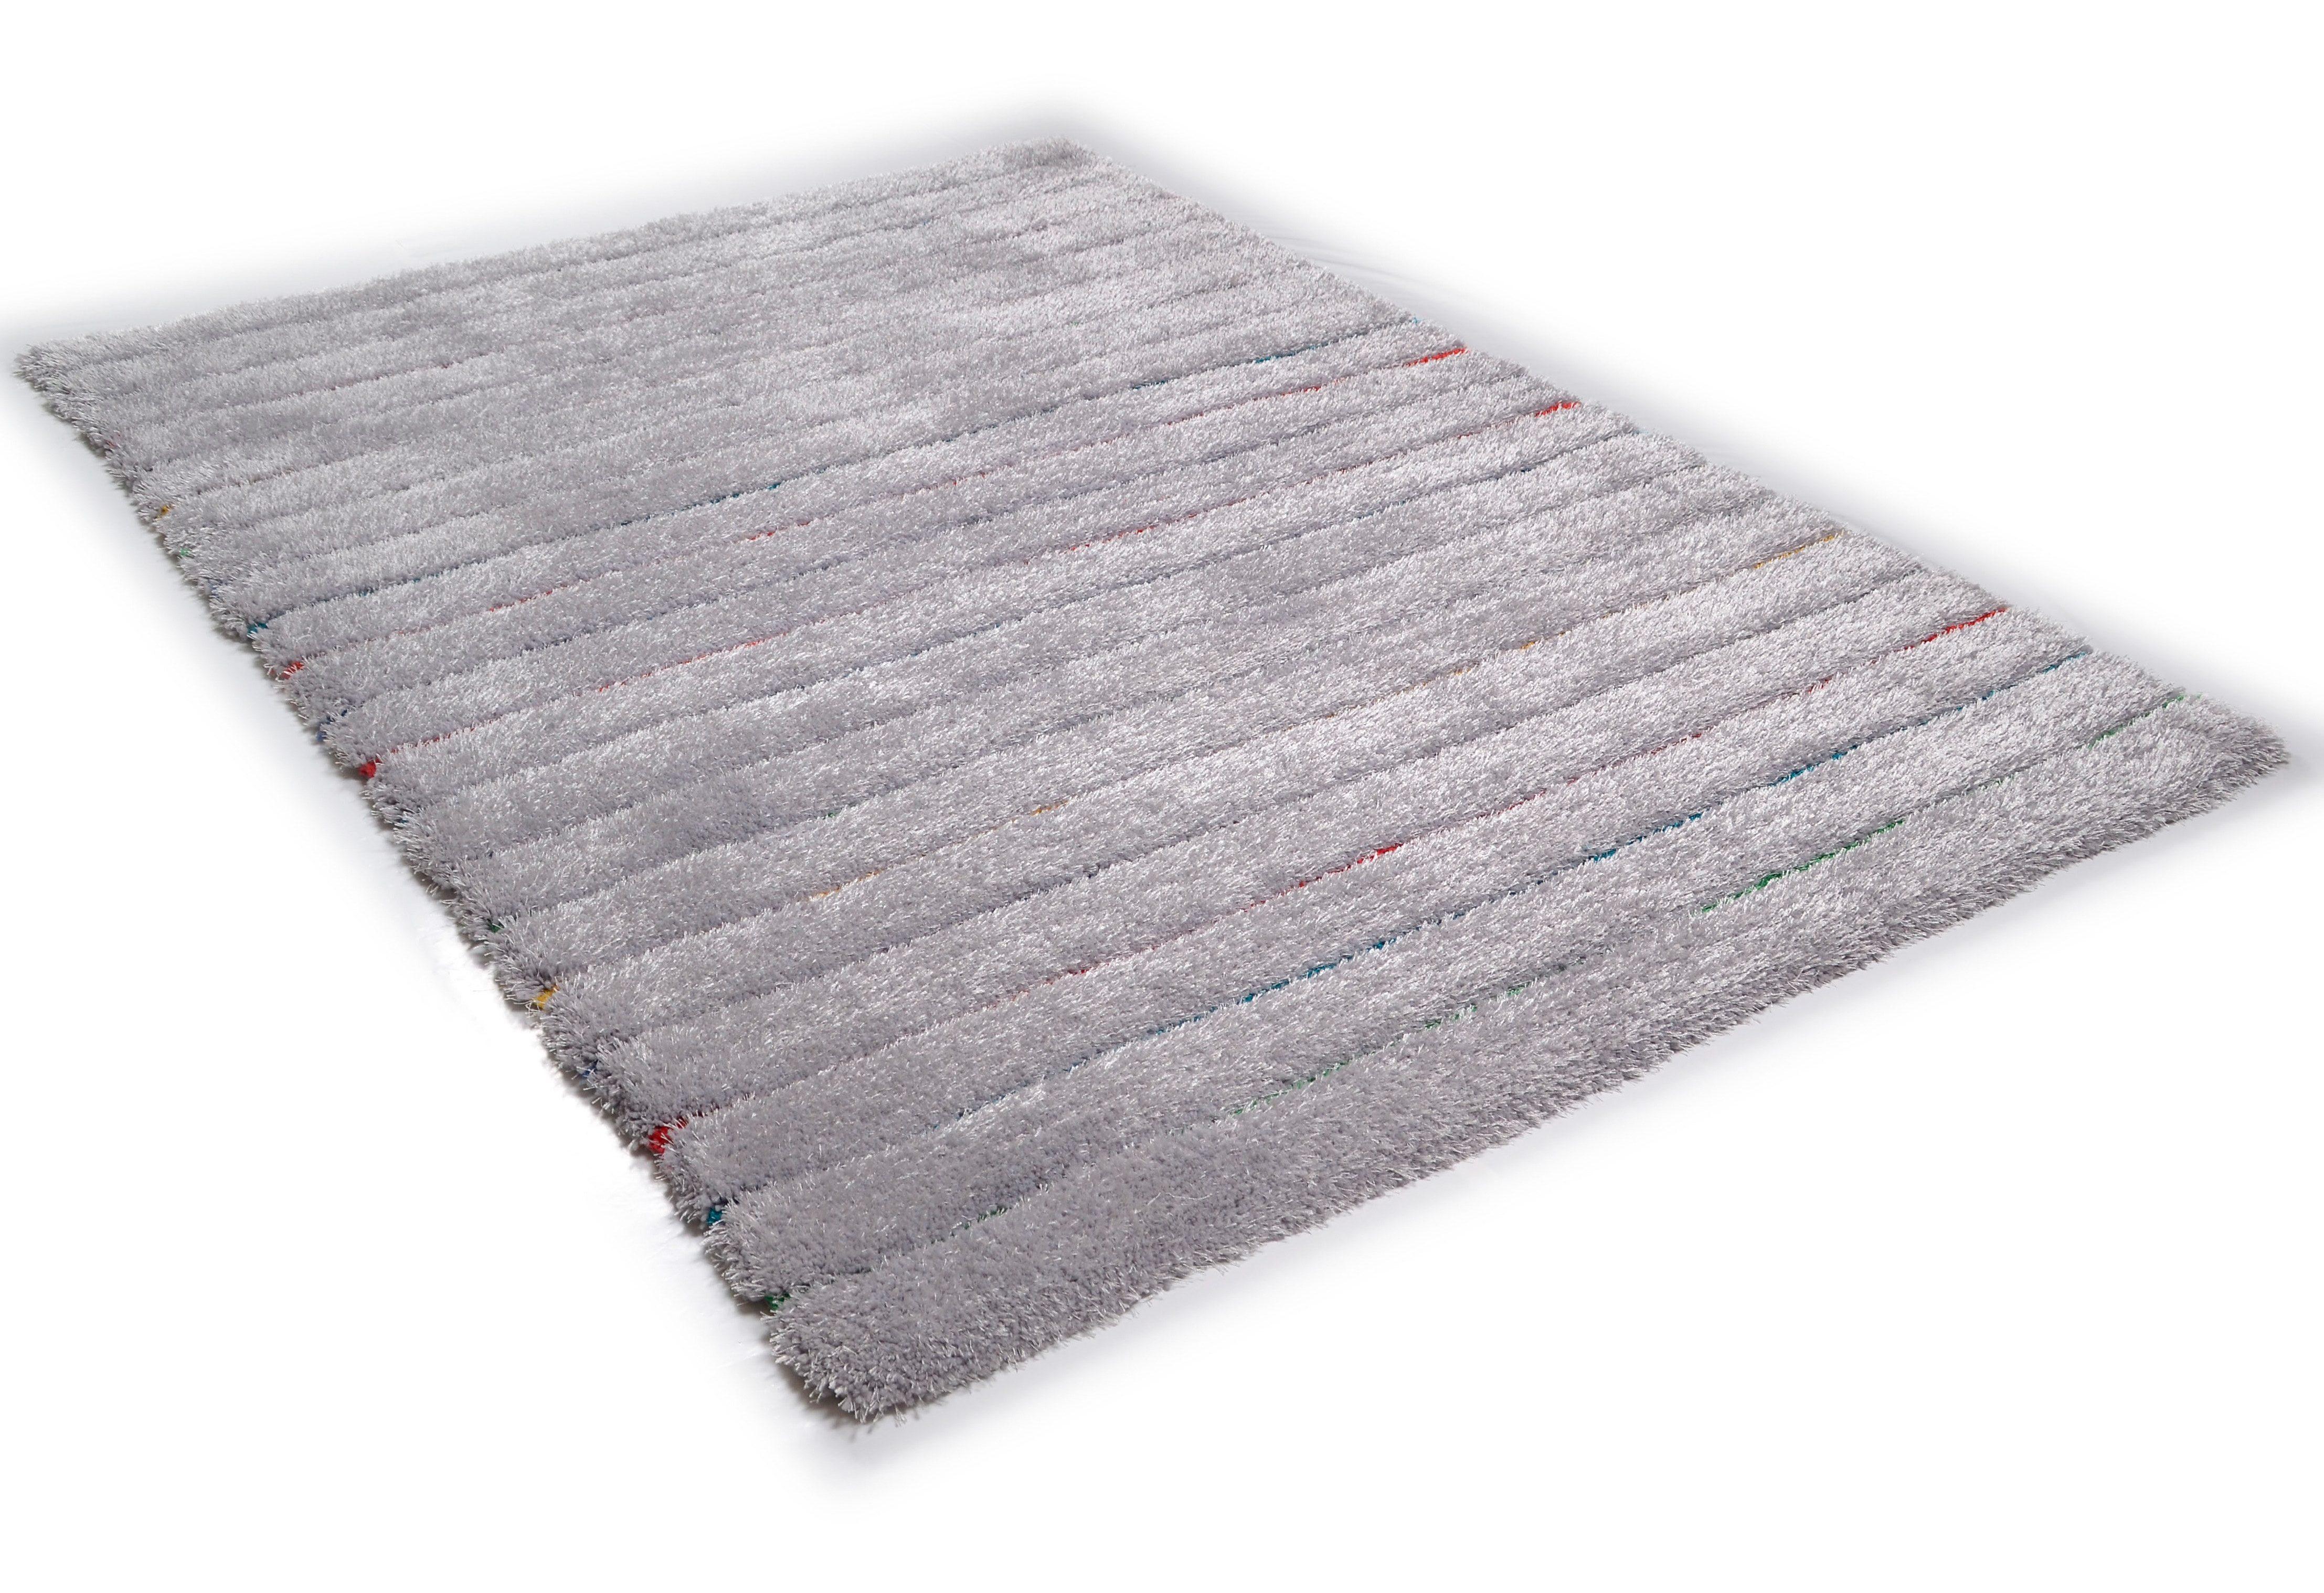 Hochflor-Teppich Soft Hidden Stripes TOM TAILOR rechteckig Höhe 35 mm handgetuftet